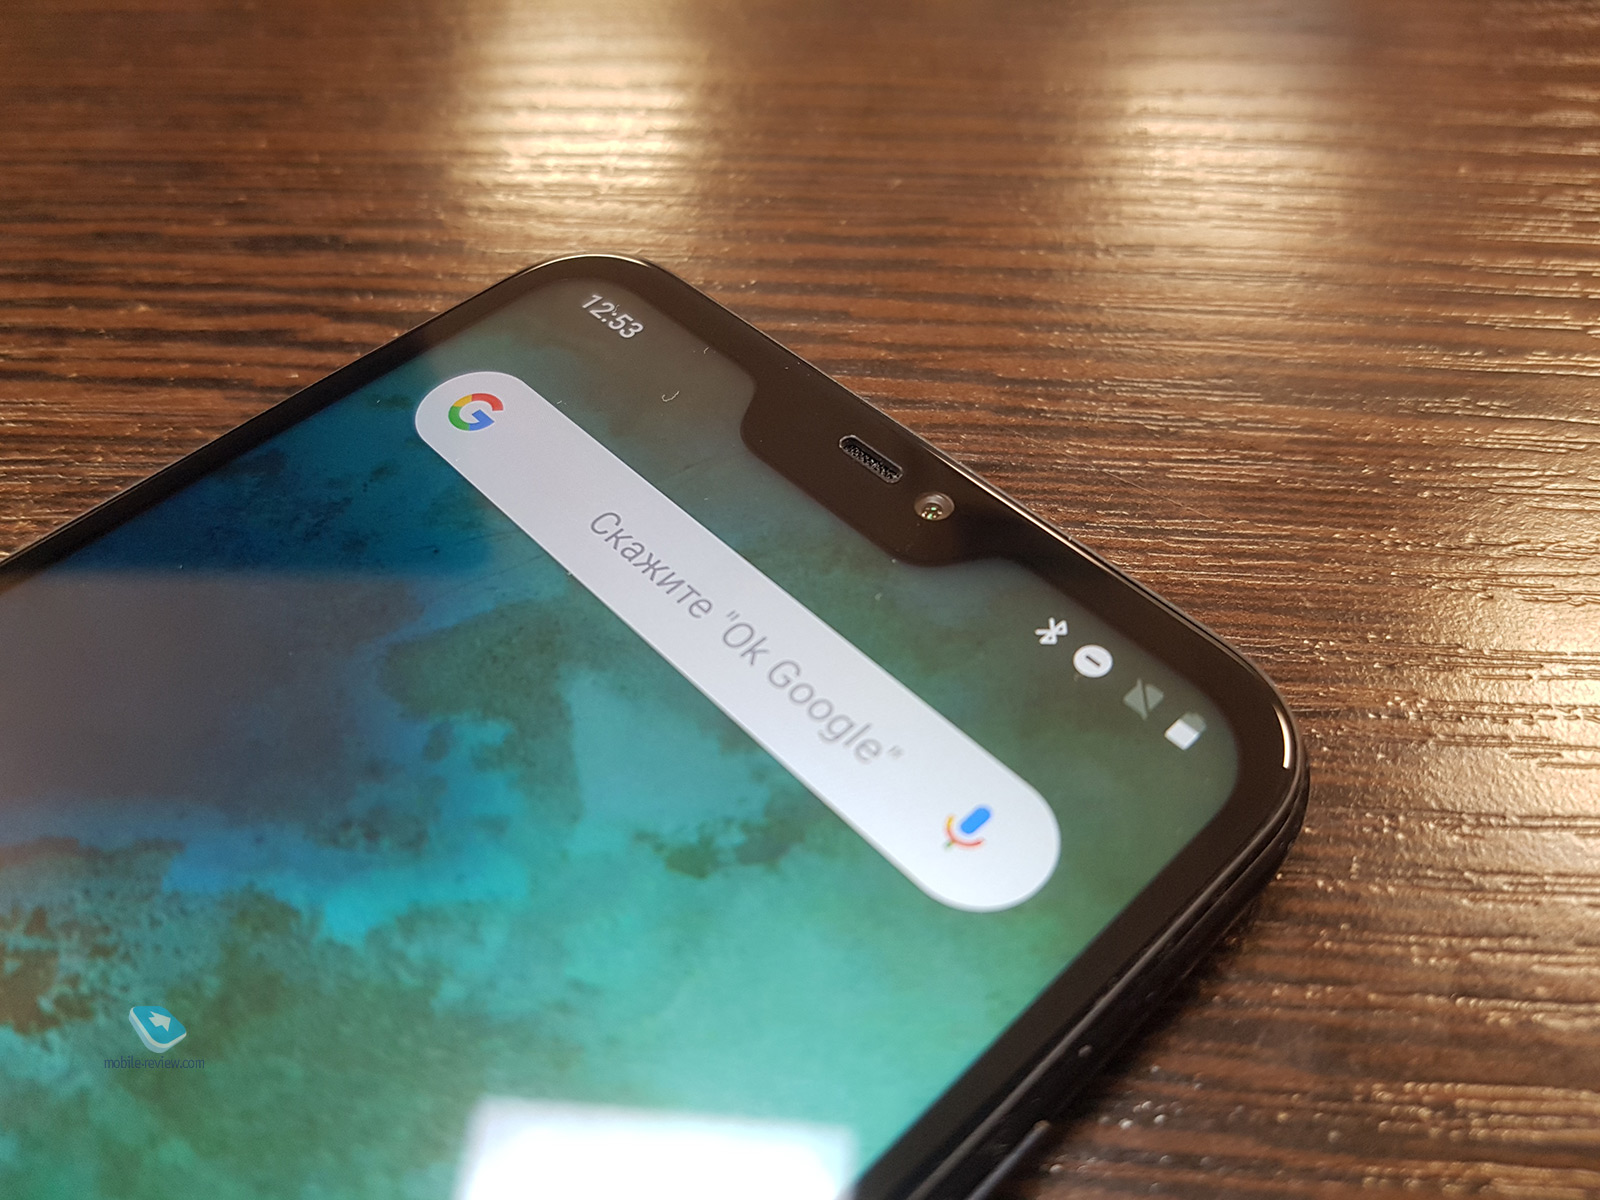 Mobile-review com Обзор смартфона Xiaomi Mi A2 Lite